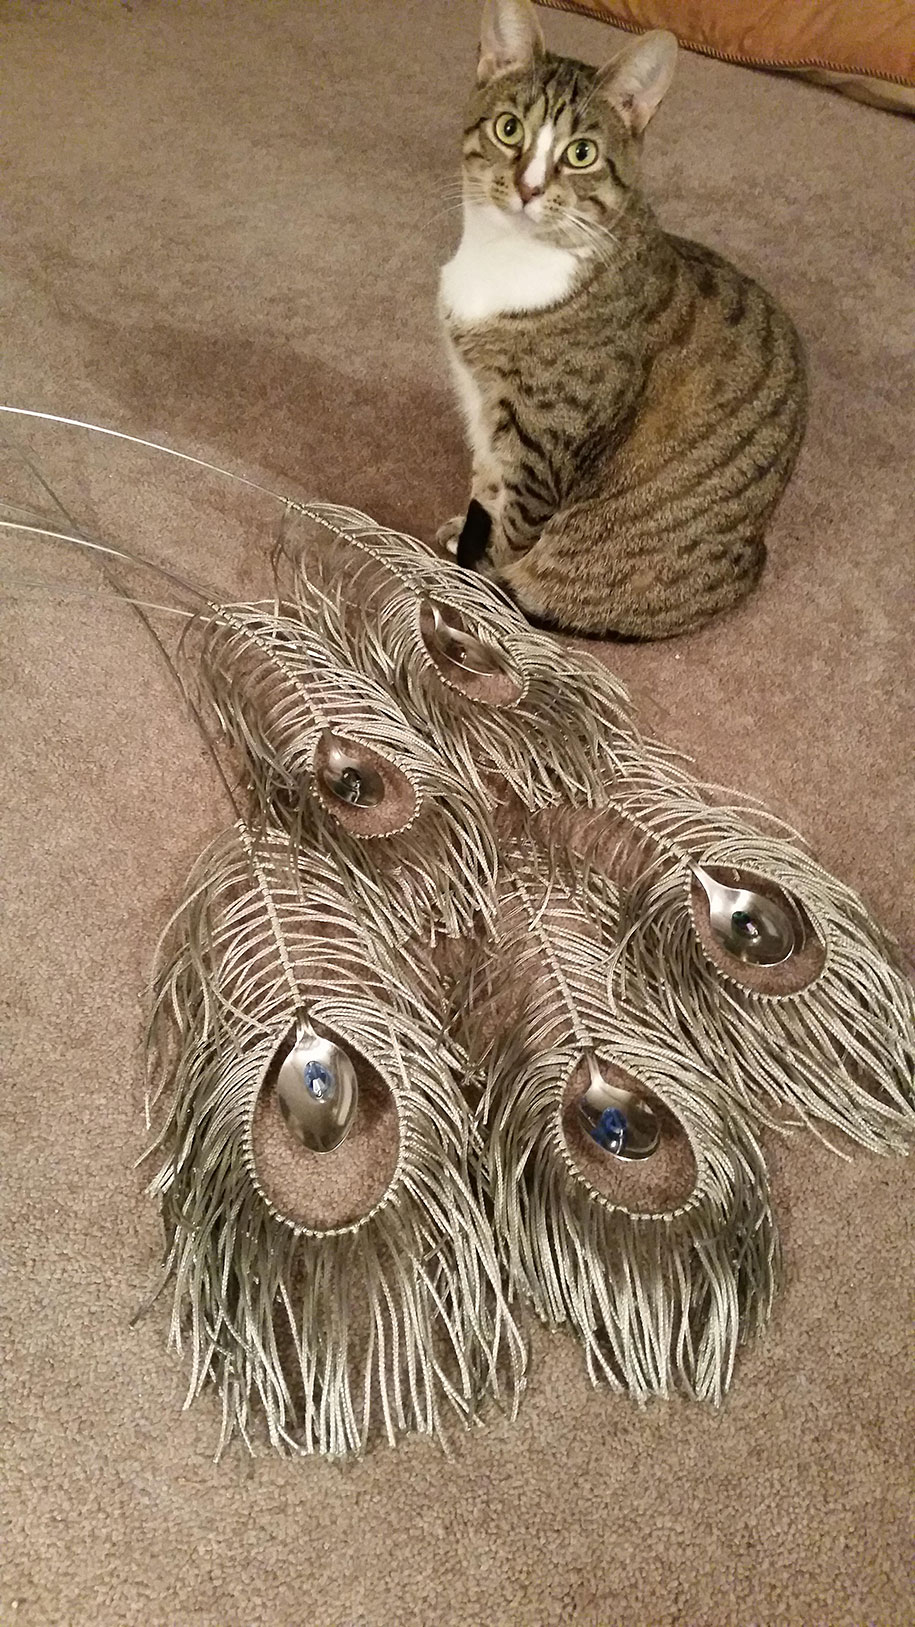 found-object-sculpture-metal-peacock-liddlenomnom-2